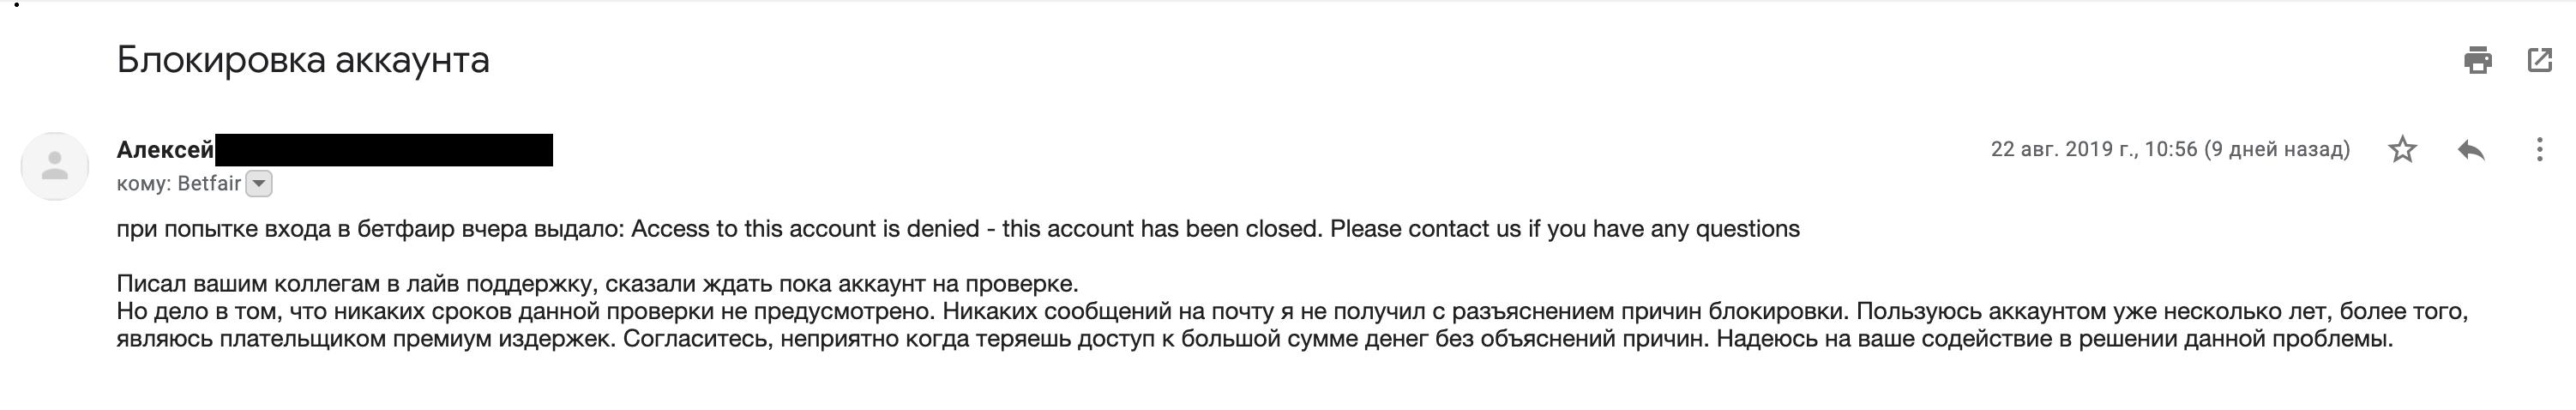 ru отзывы betfair